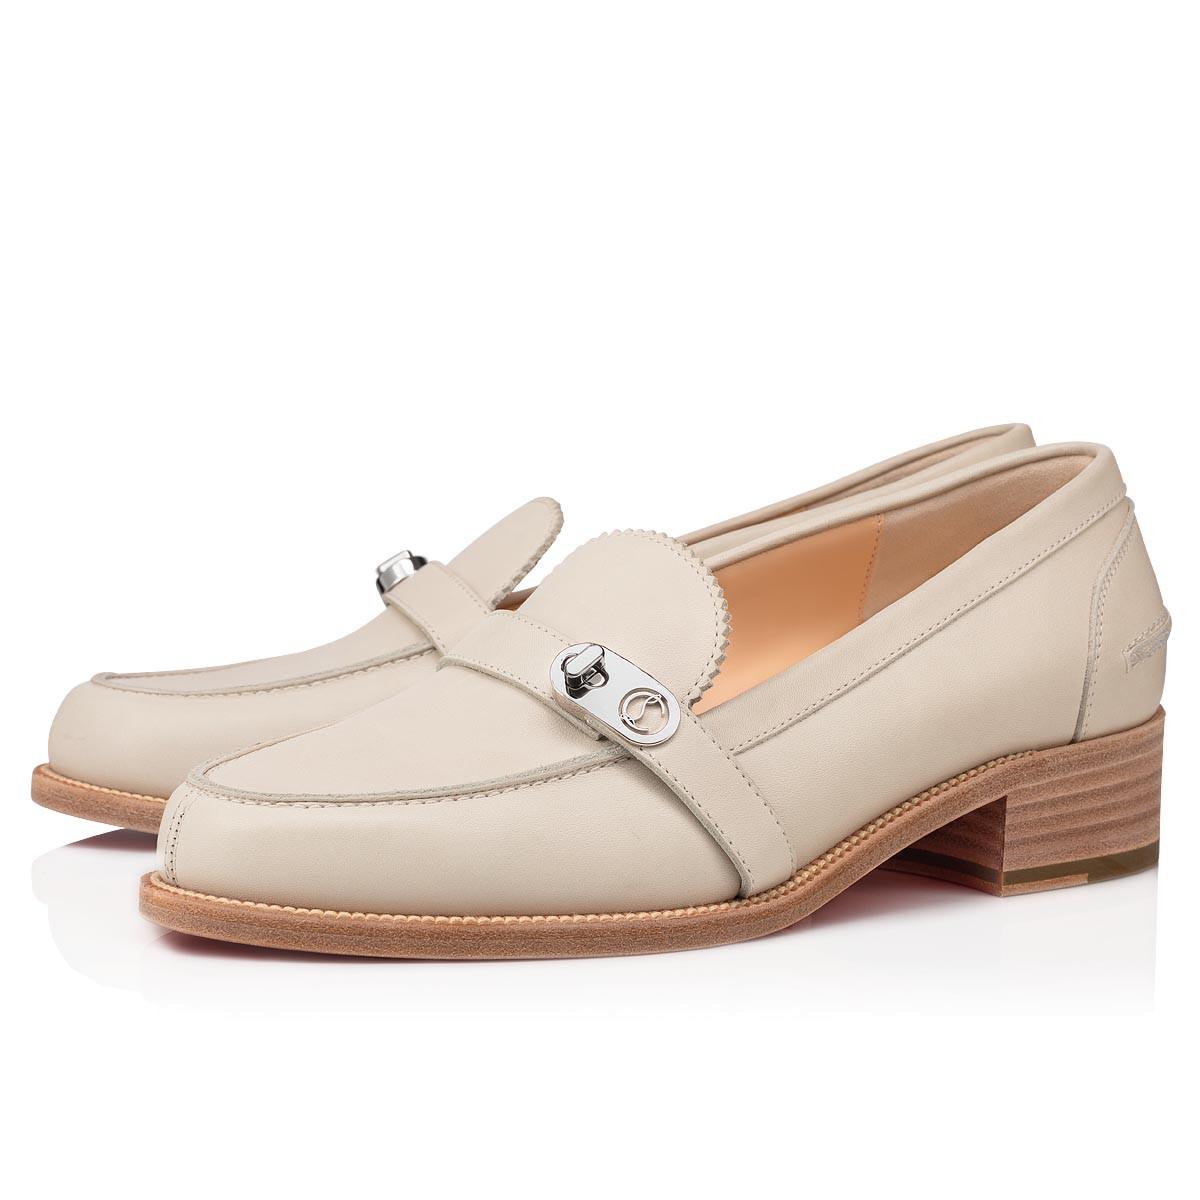 Shoes - Lock Me Moc - Christian Louboutin